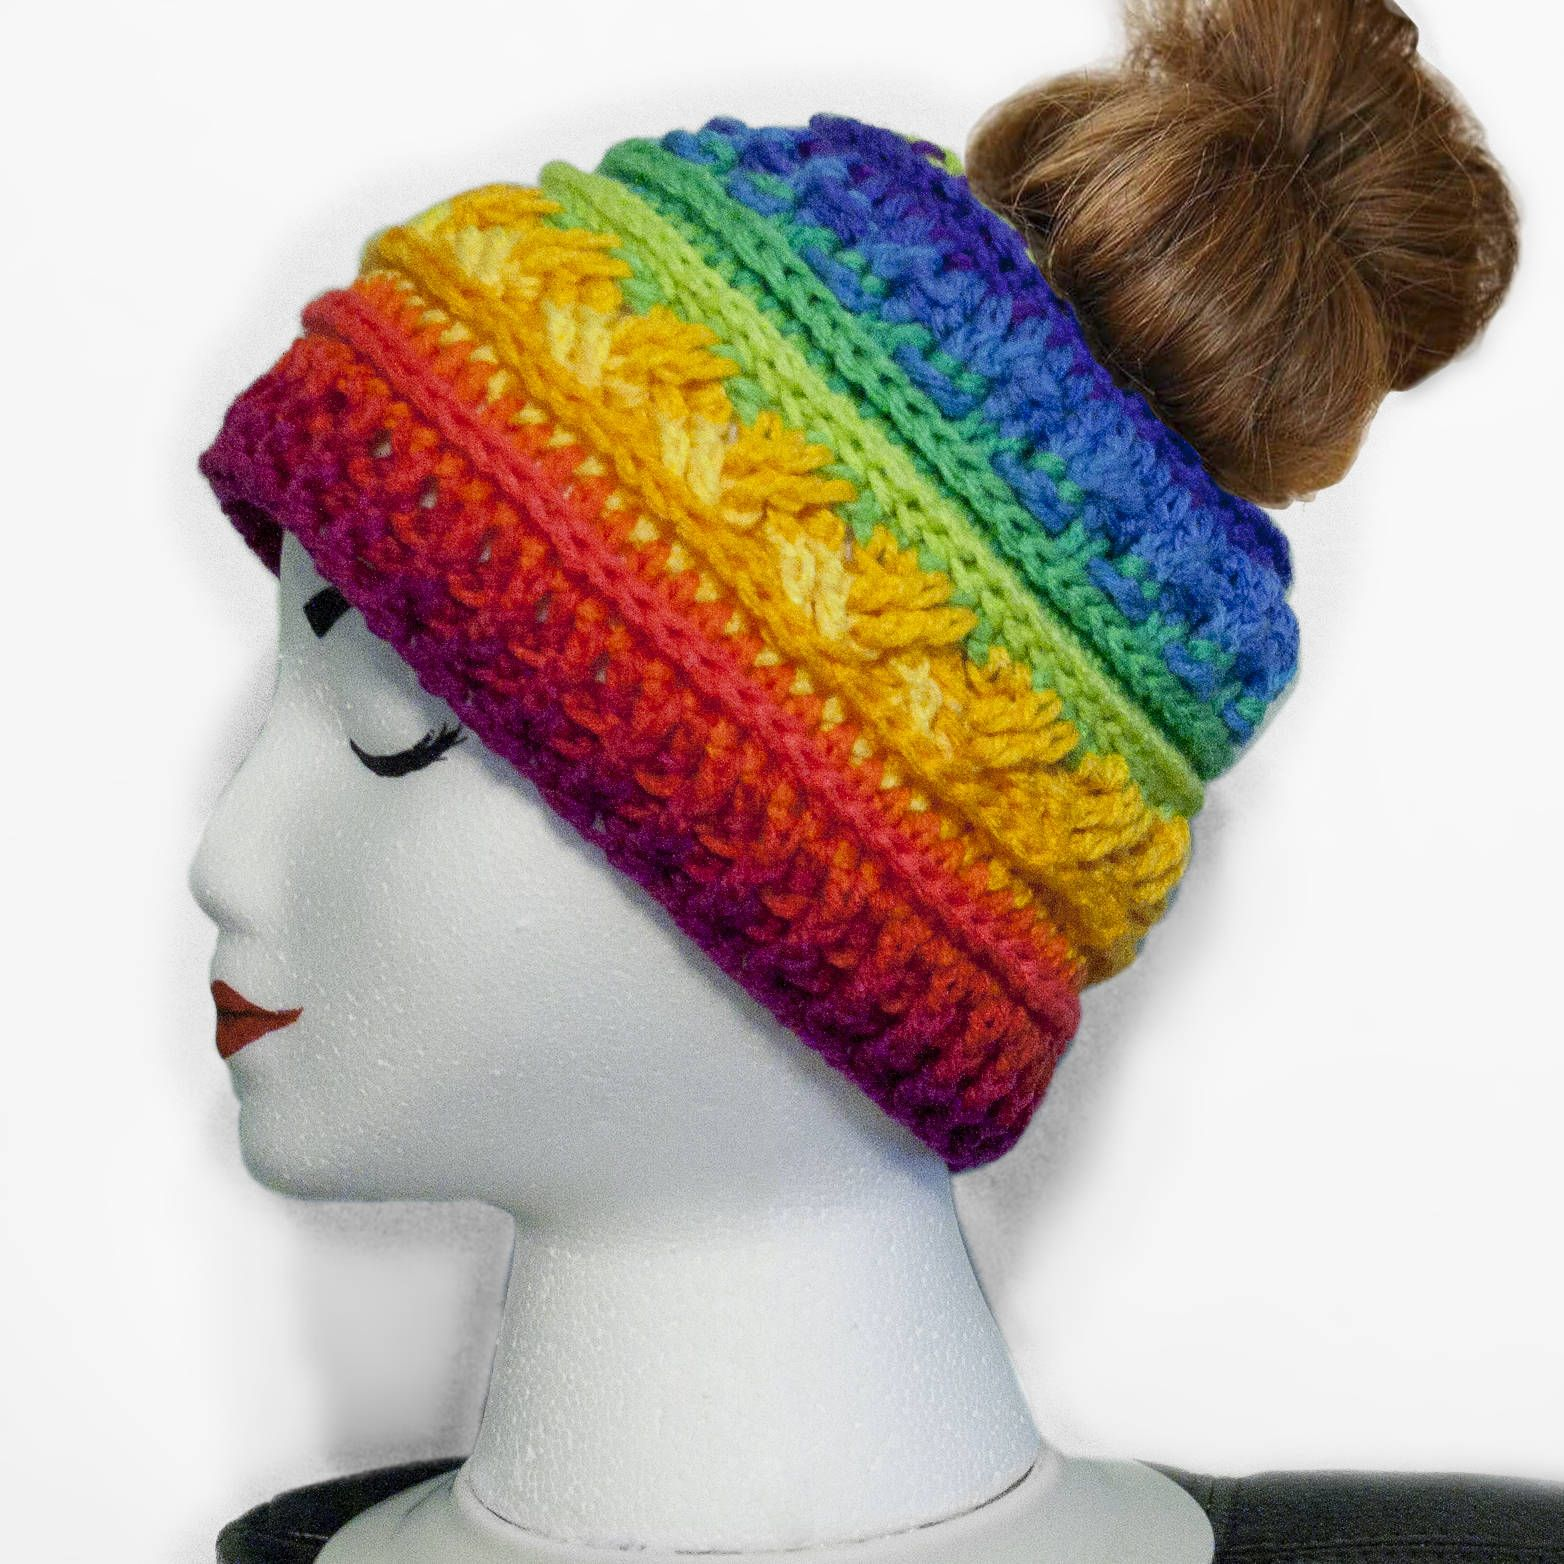 d527a7de572 Buy a Hand Made Colorful Crochet Messy Bun Beanie